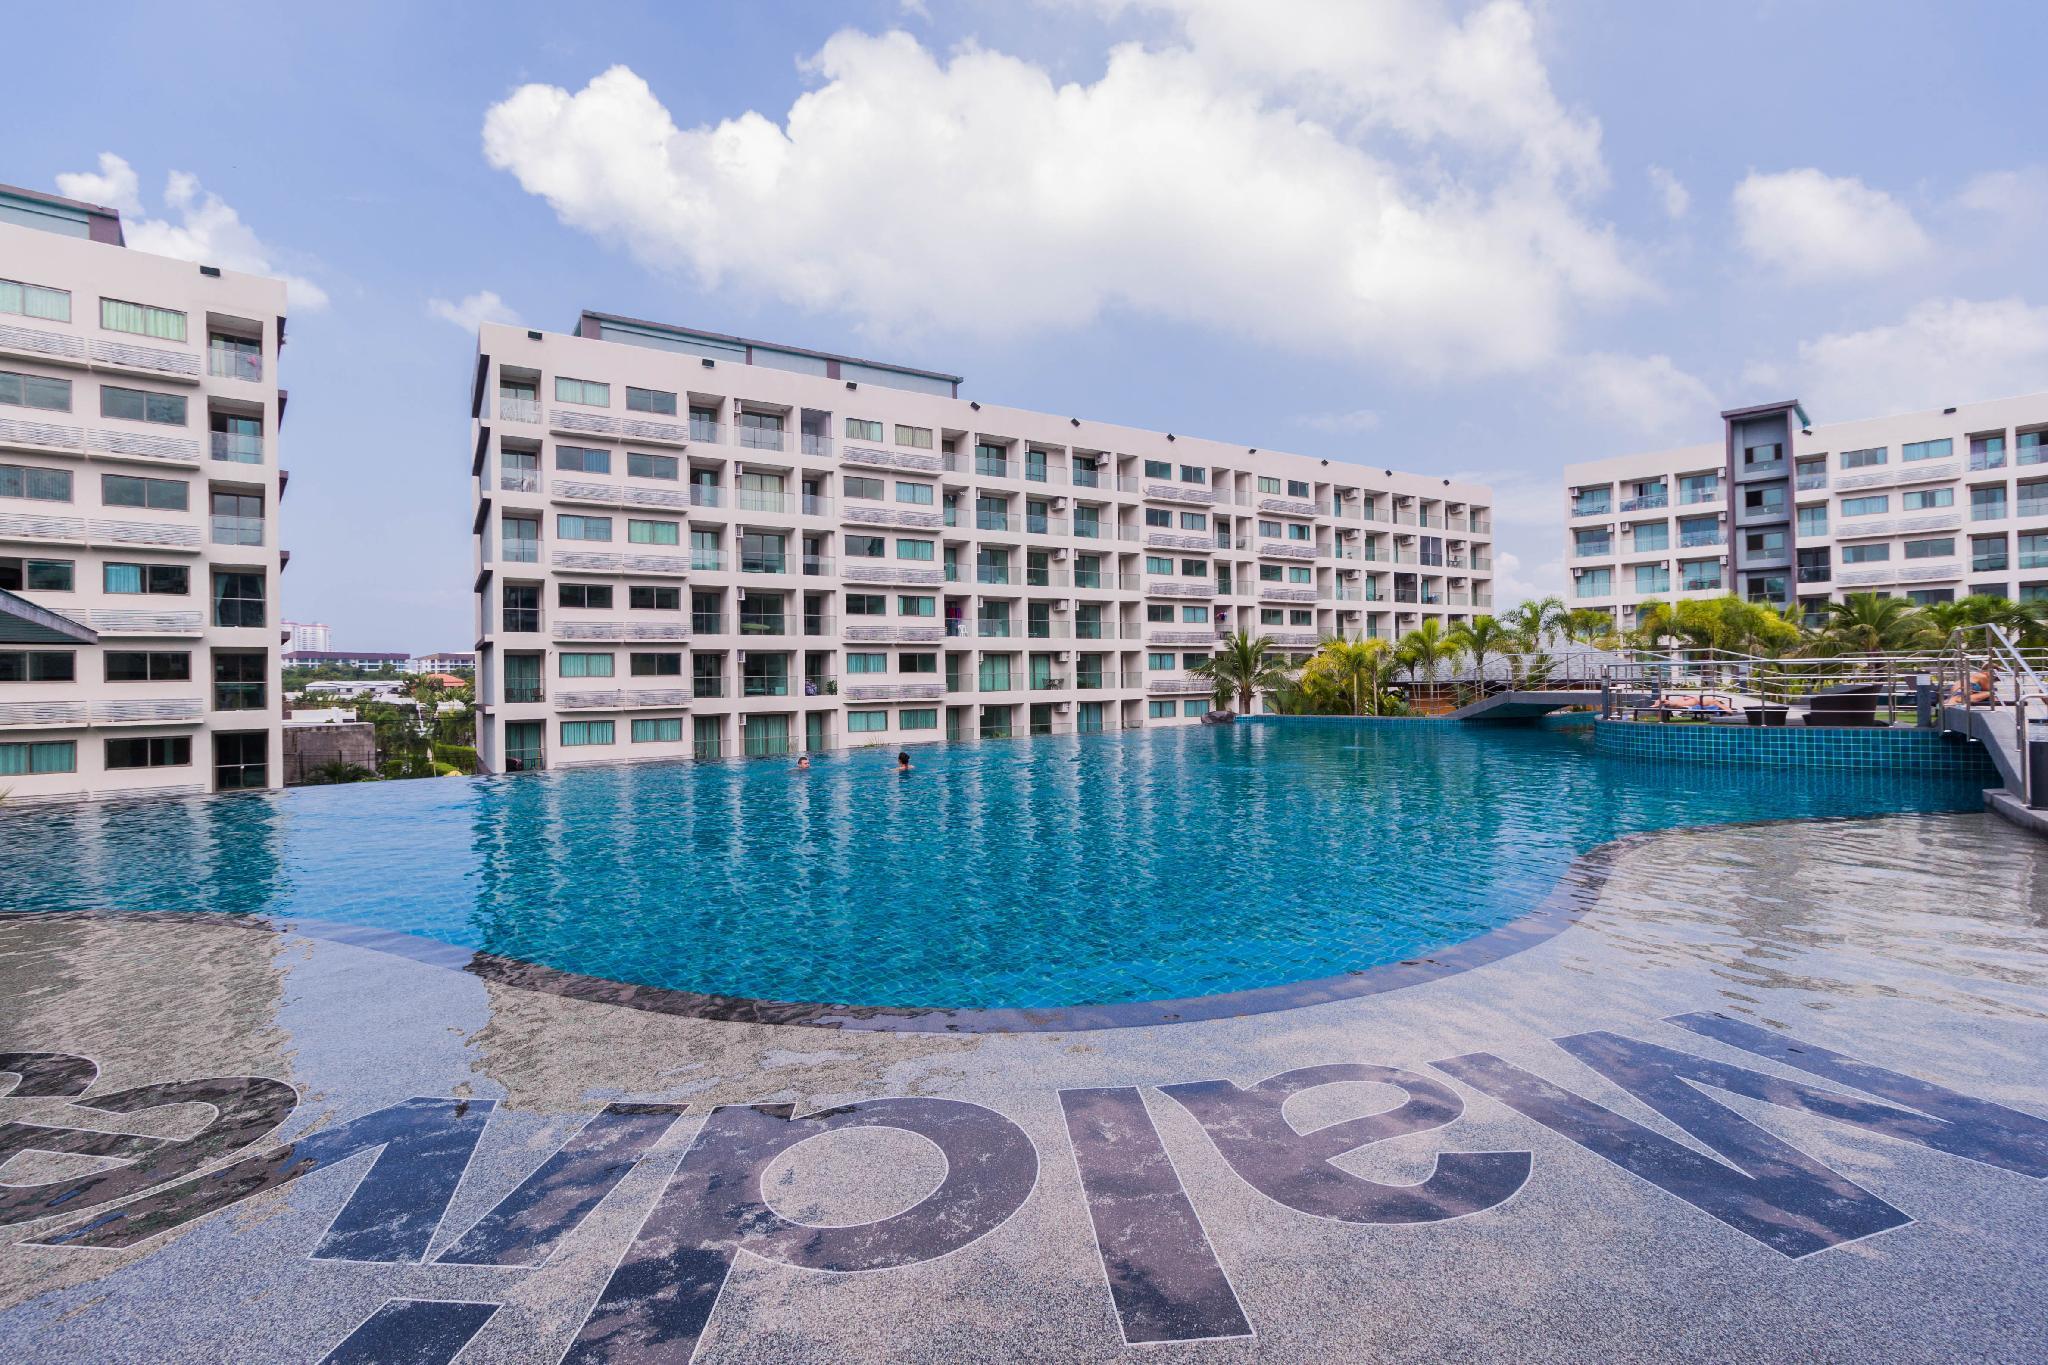 Maldives Resort BY PSR